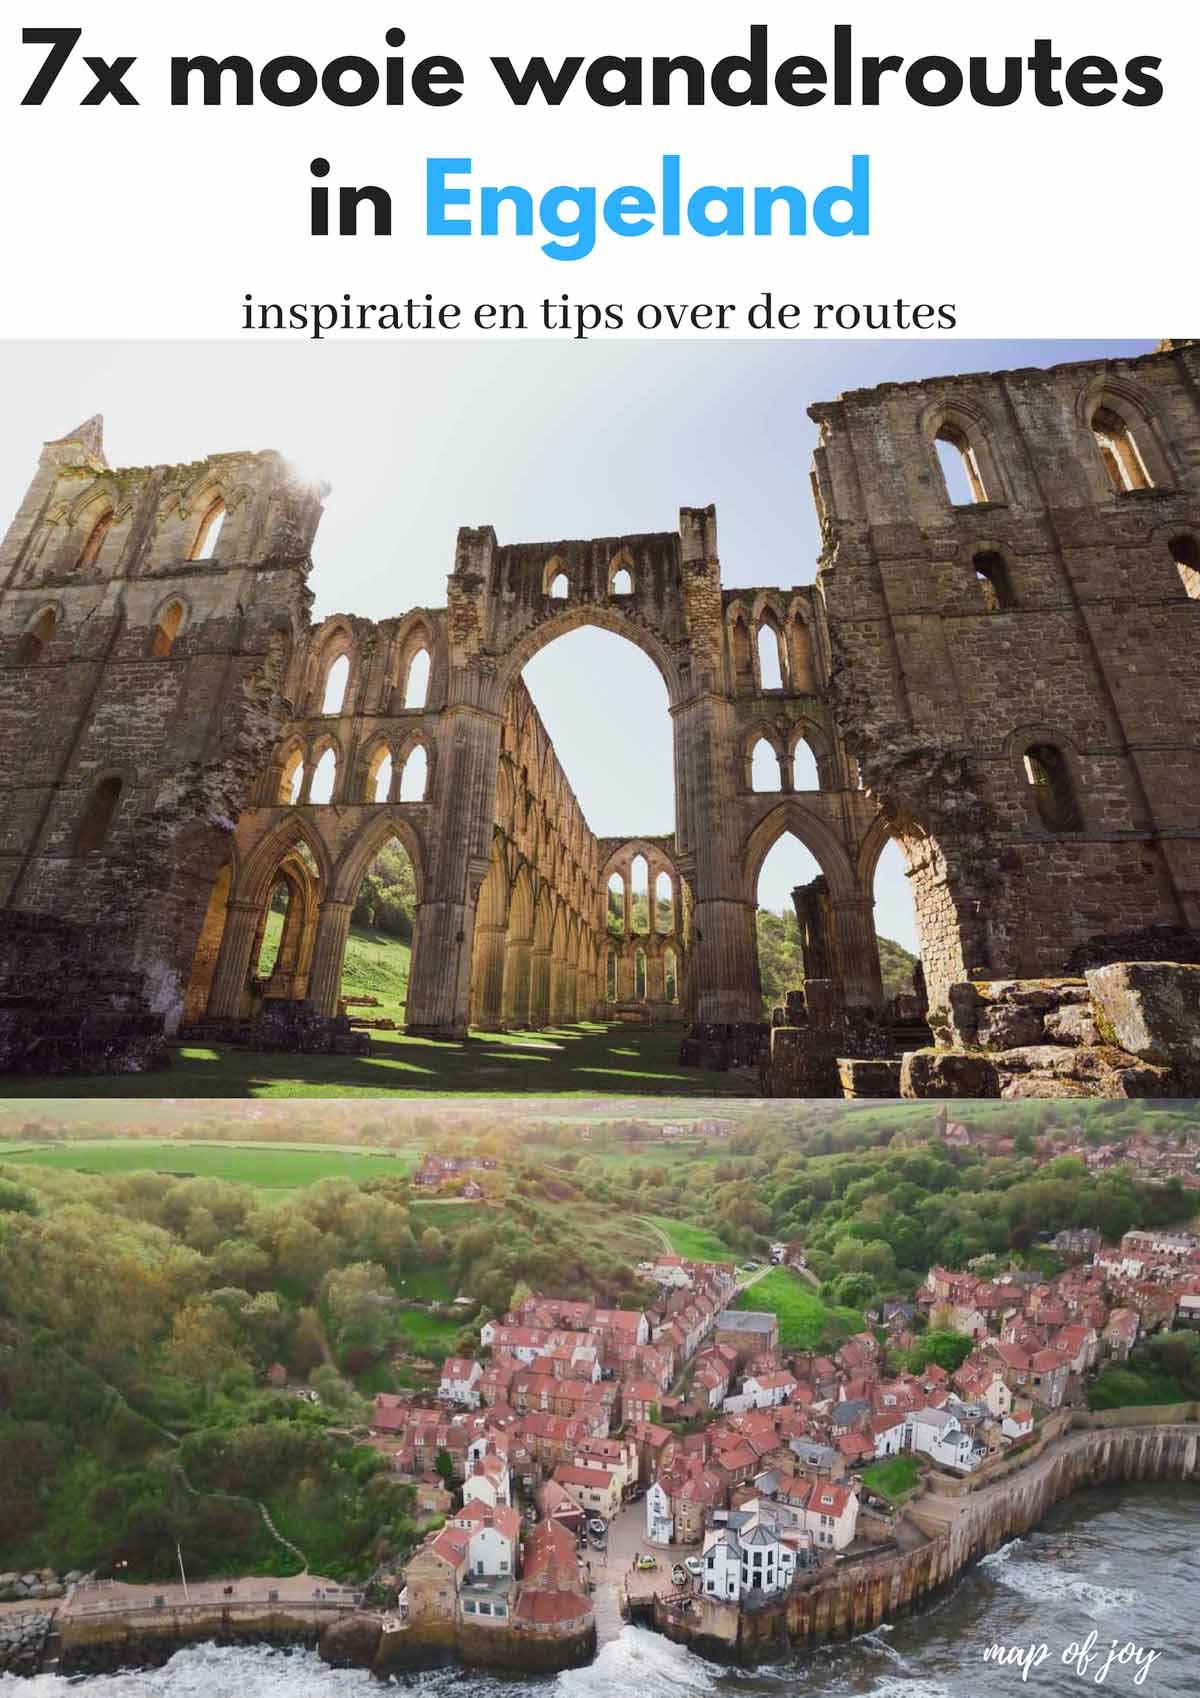 7x mooie wandelroutes in Engeland - Map of Joy